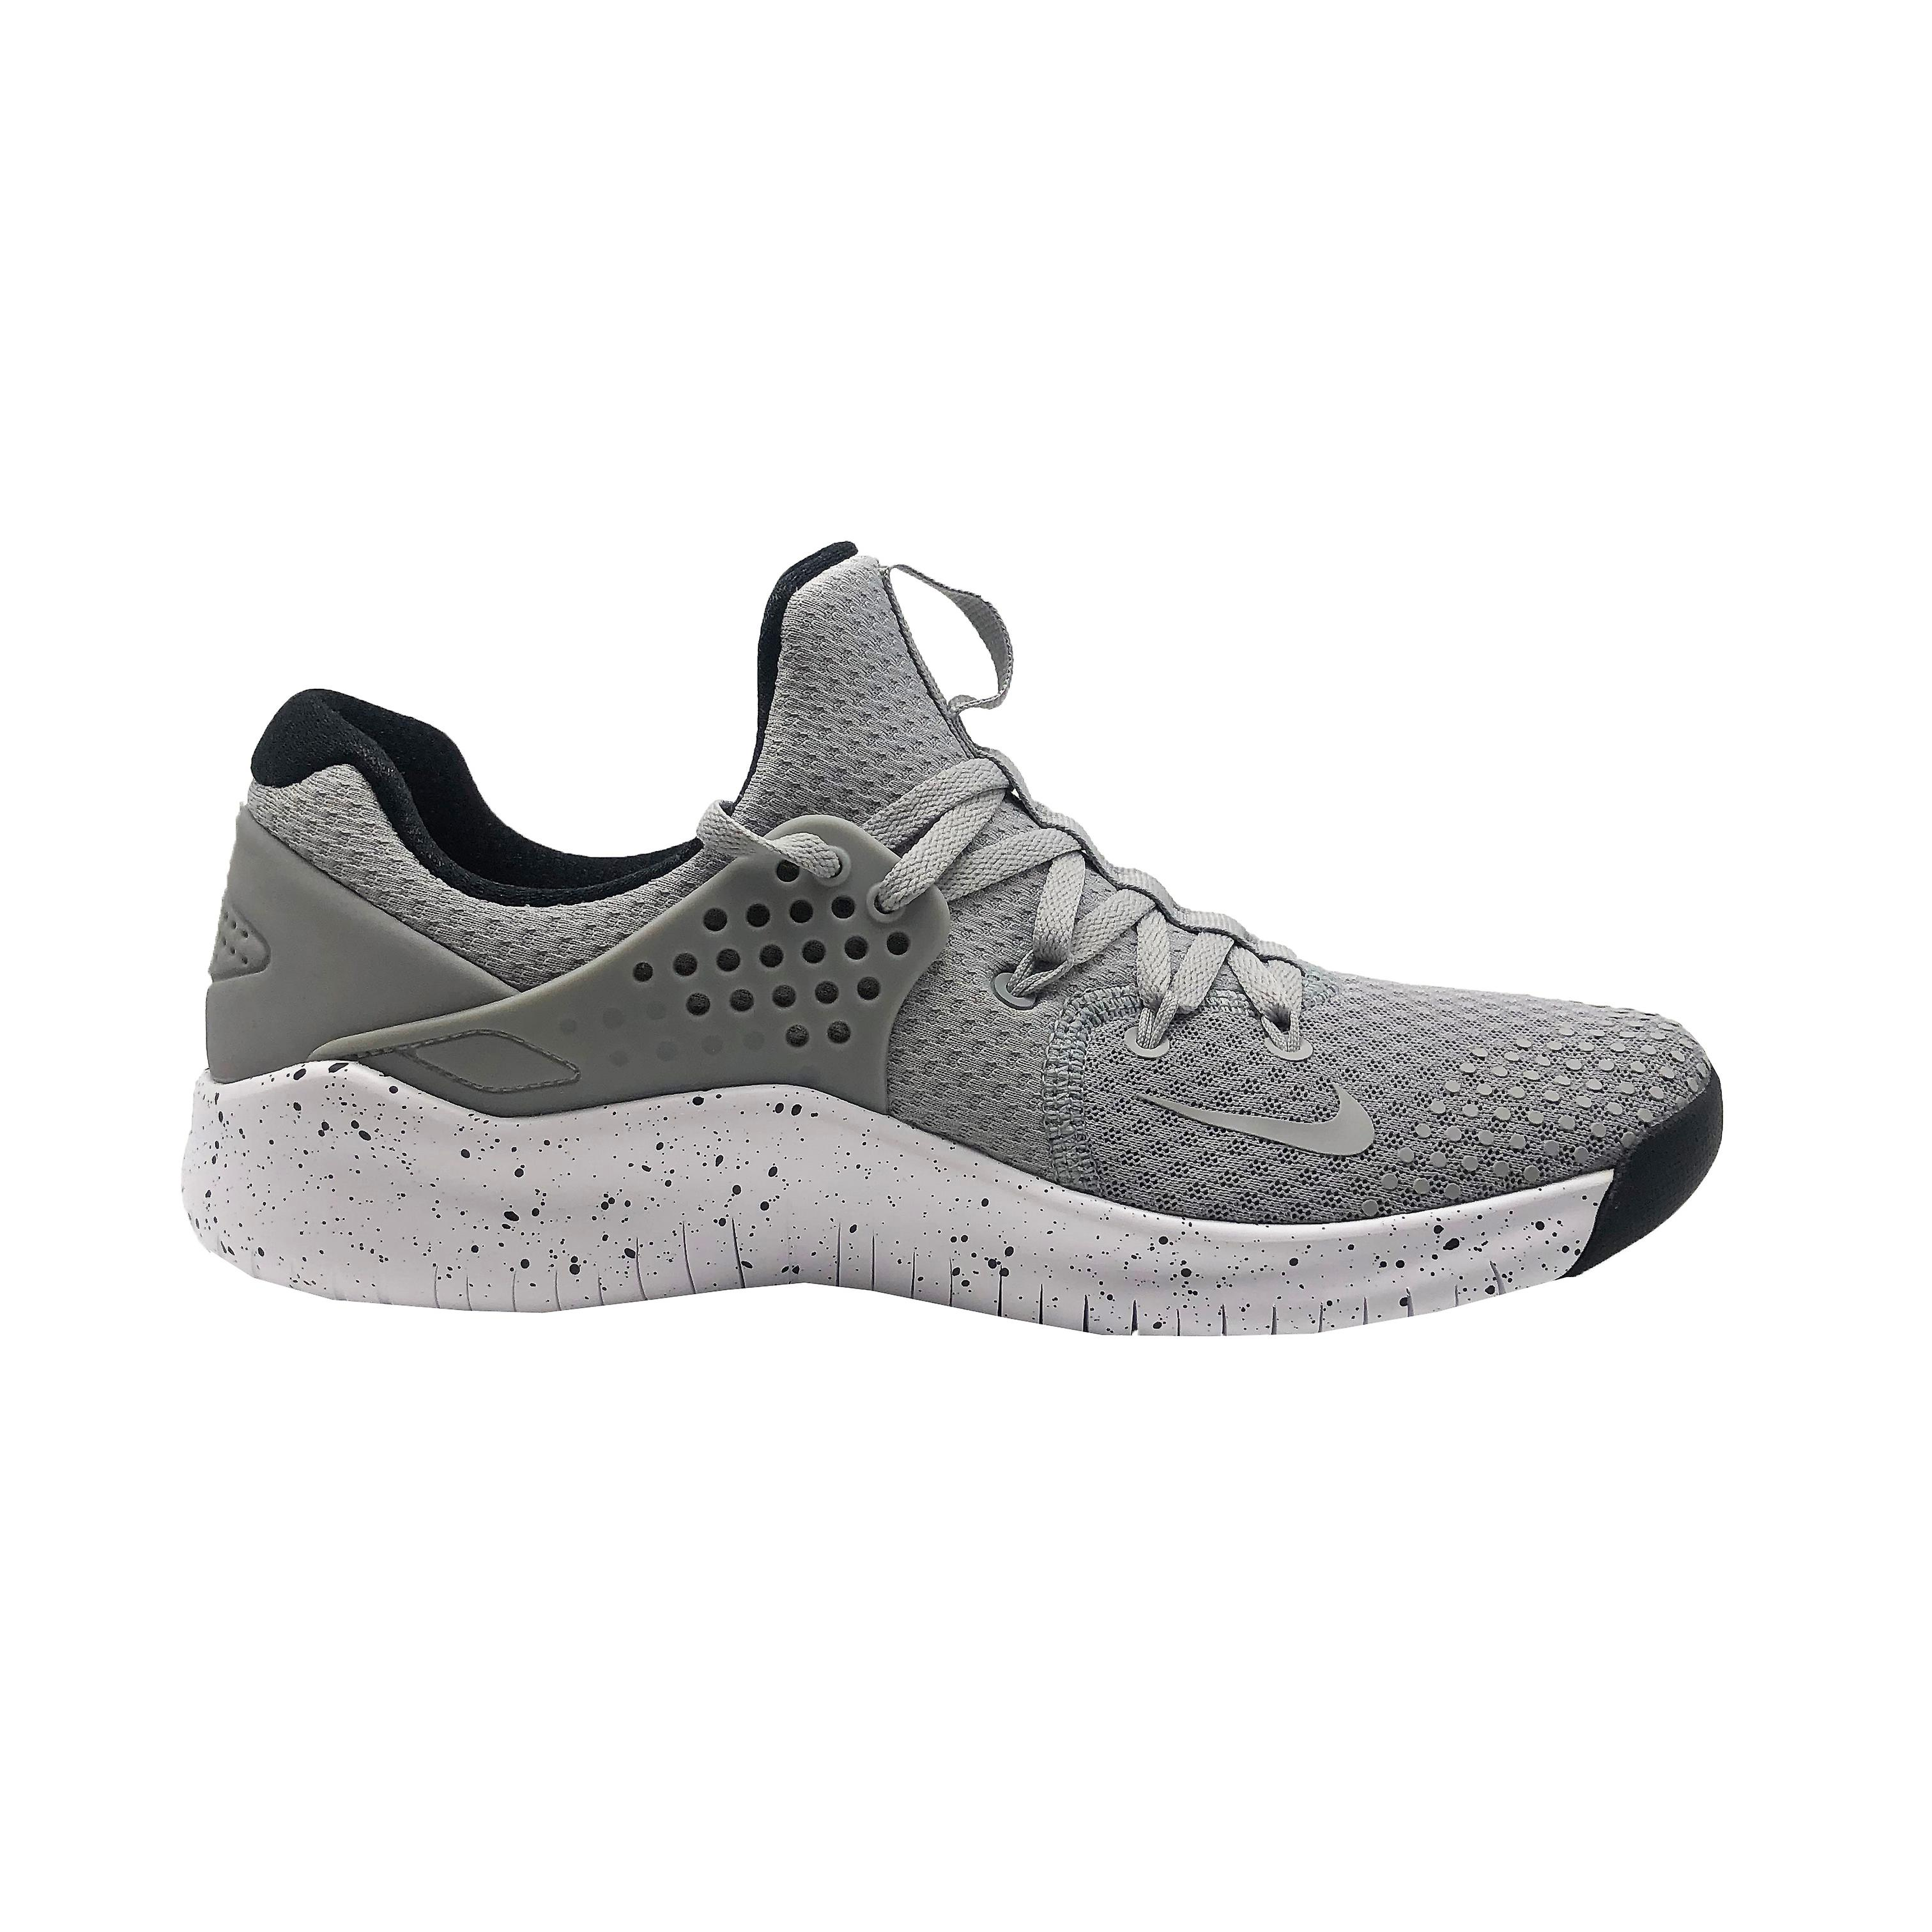 Nike Free Trainer VIII AH9395 001 Herren Trainer